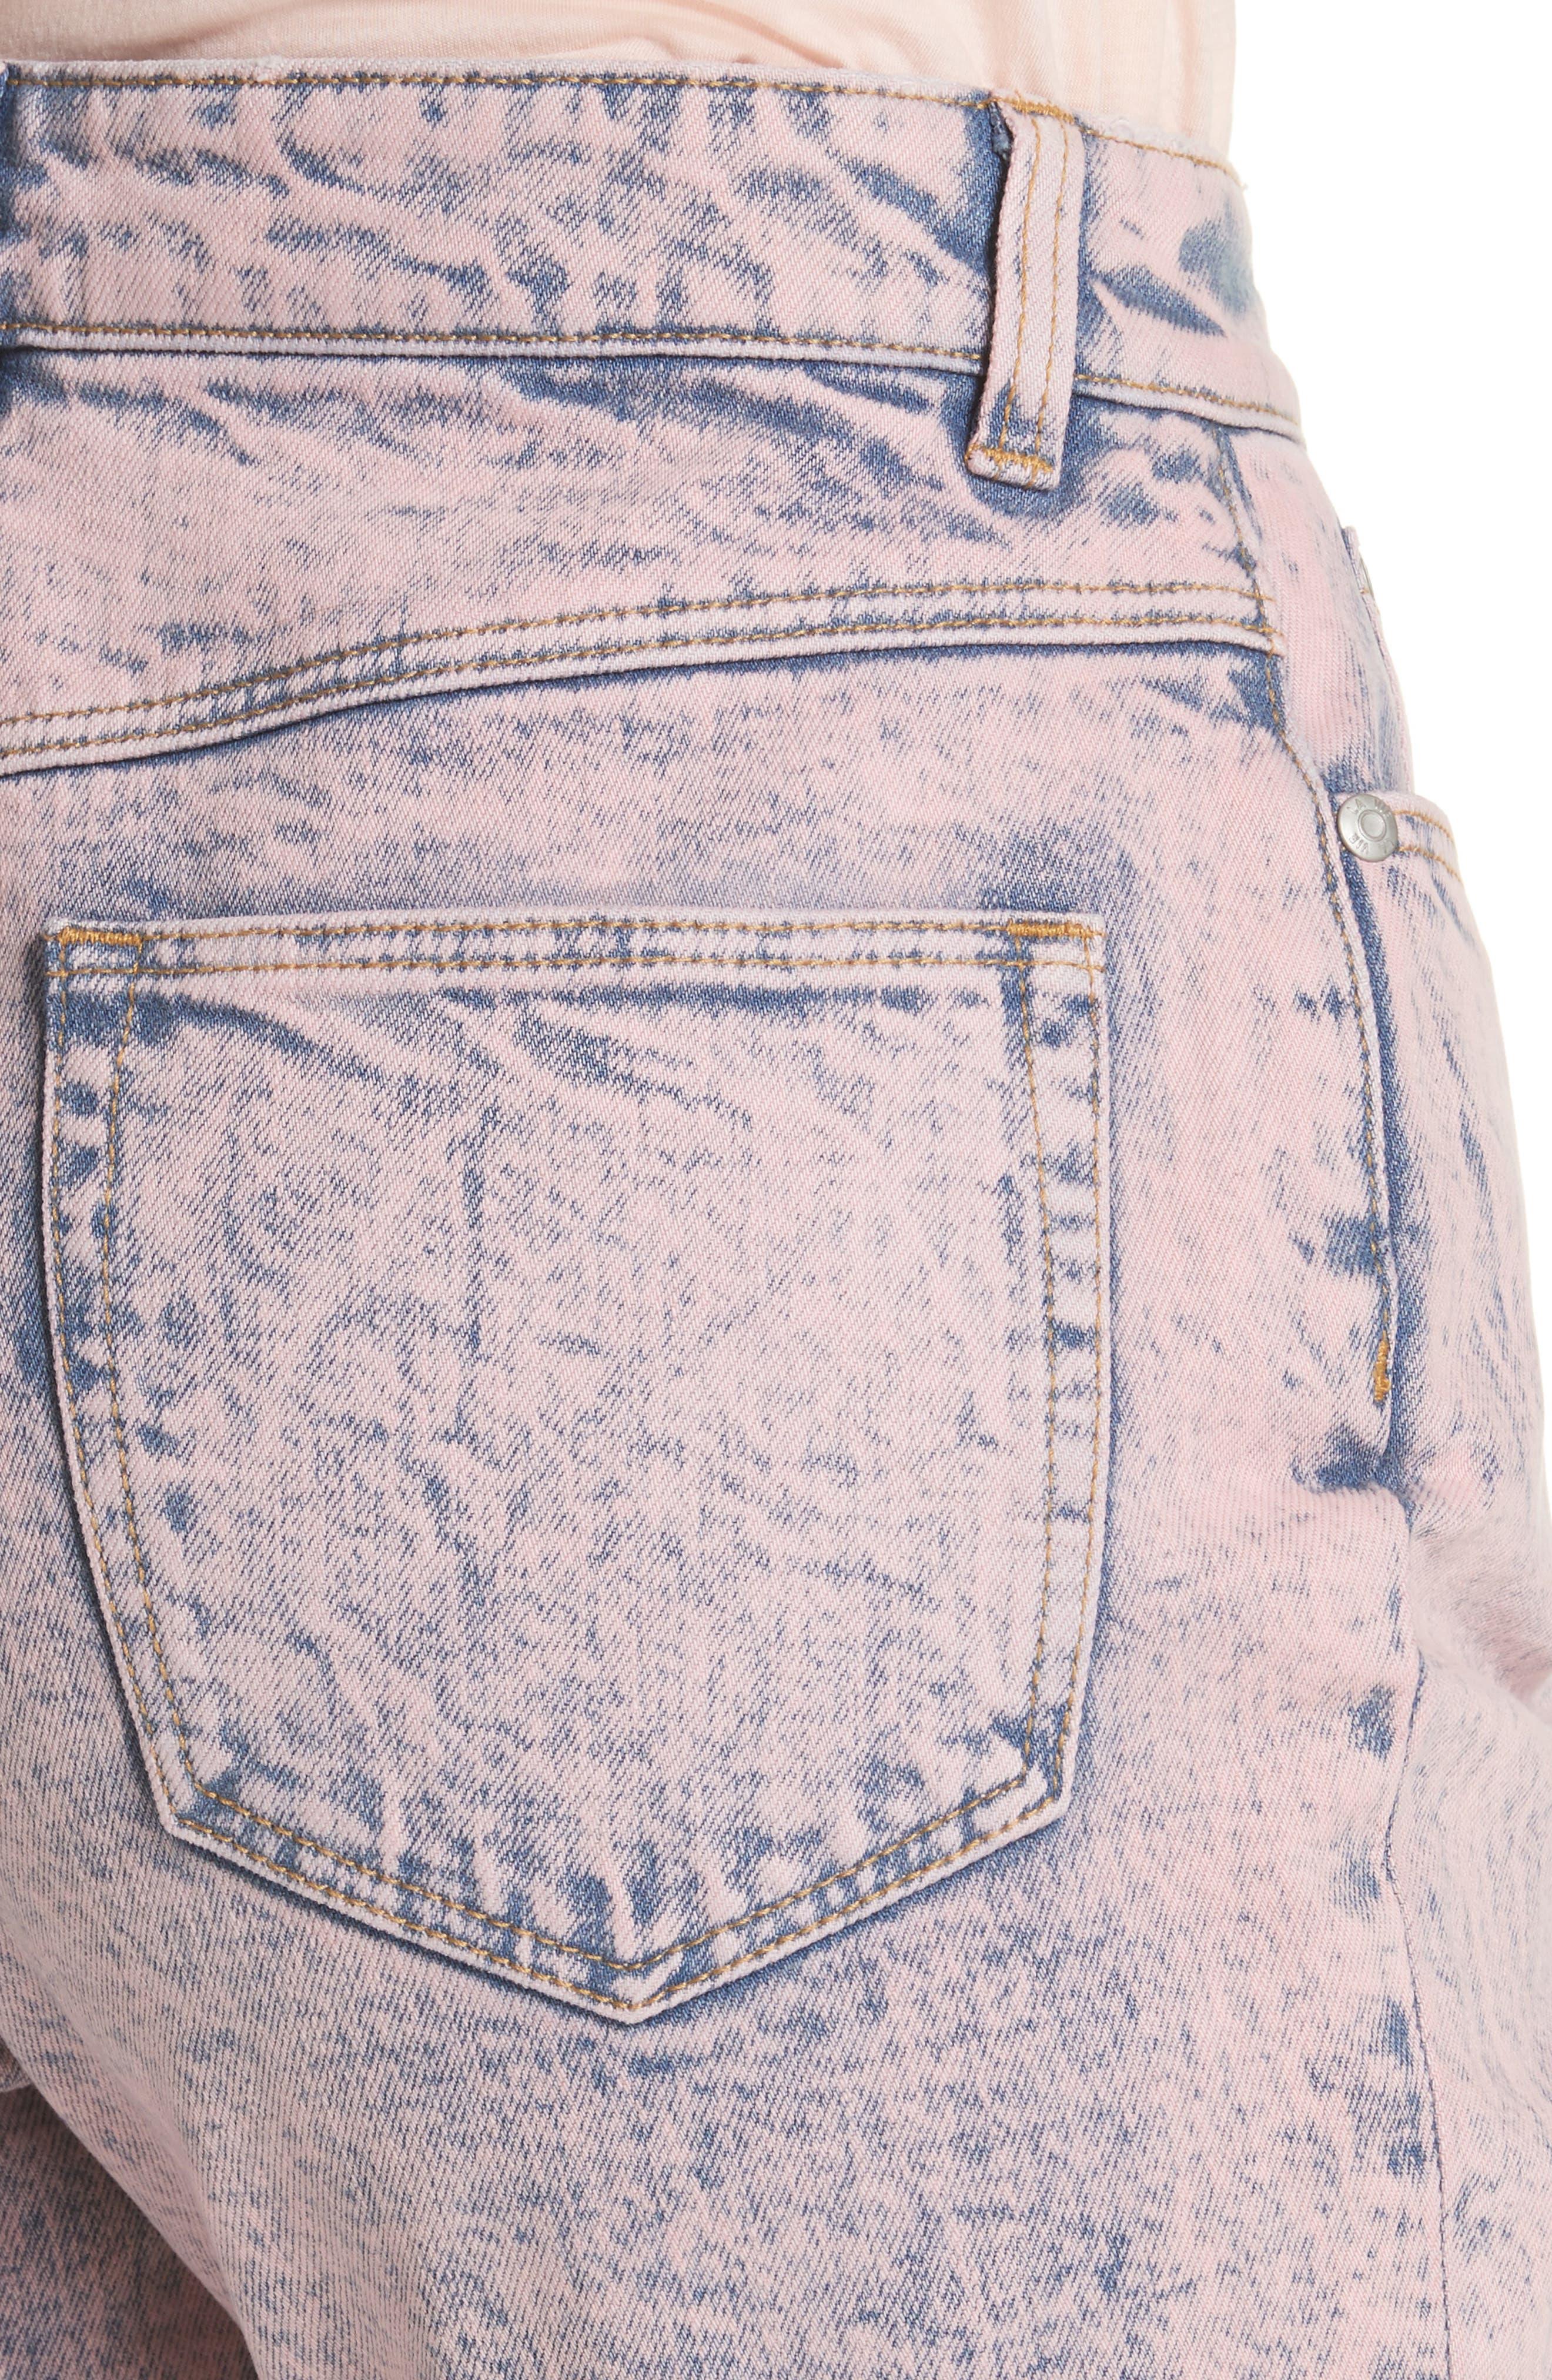 Ines Acid Wash Crop Jeans,                             Alternate thumbnail 4, color,                             Pink Overdyed Acid Wash